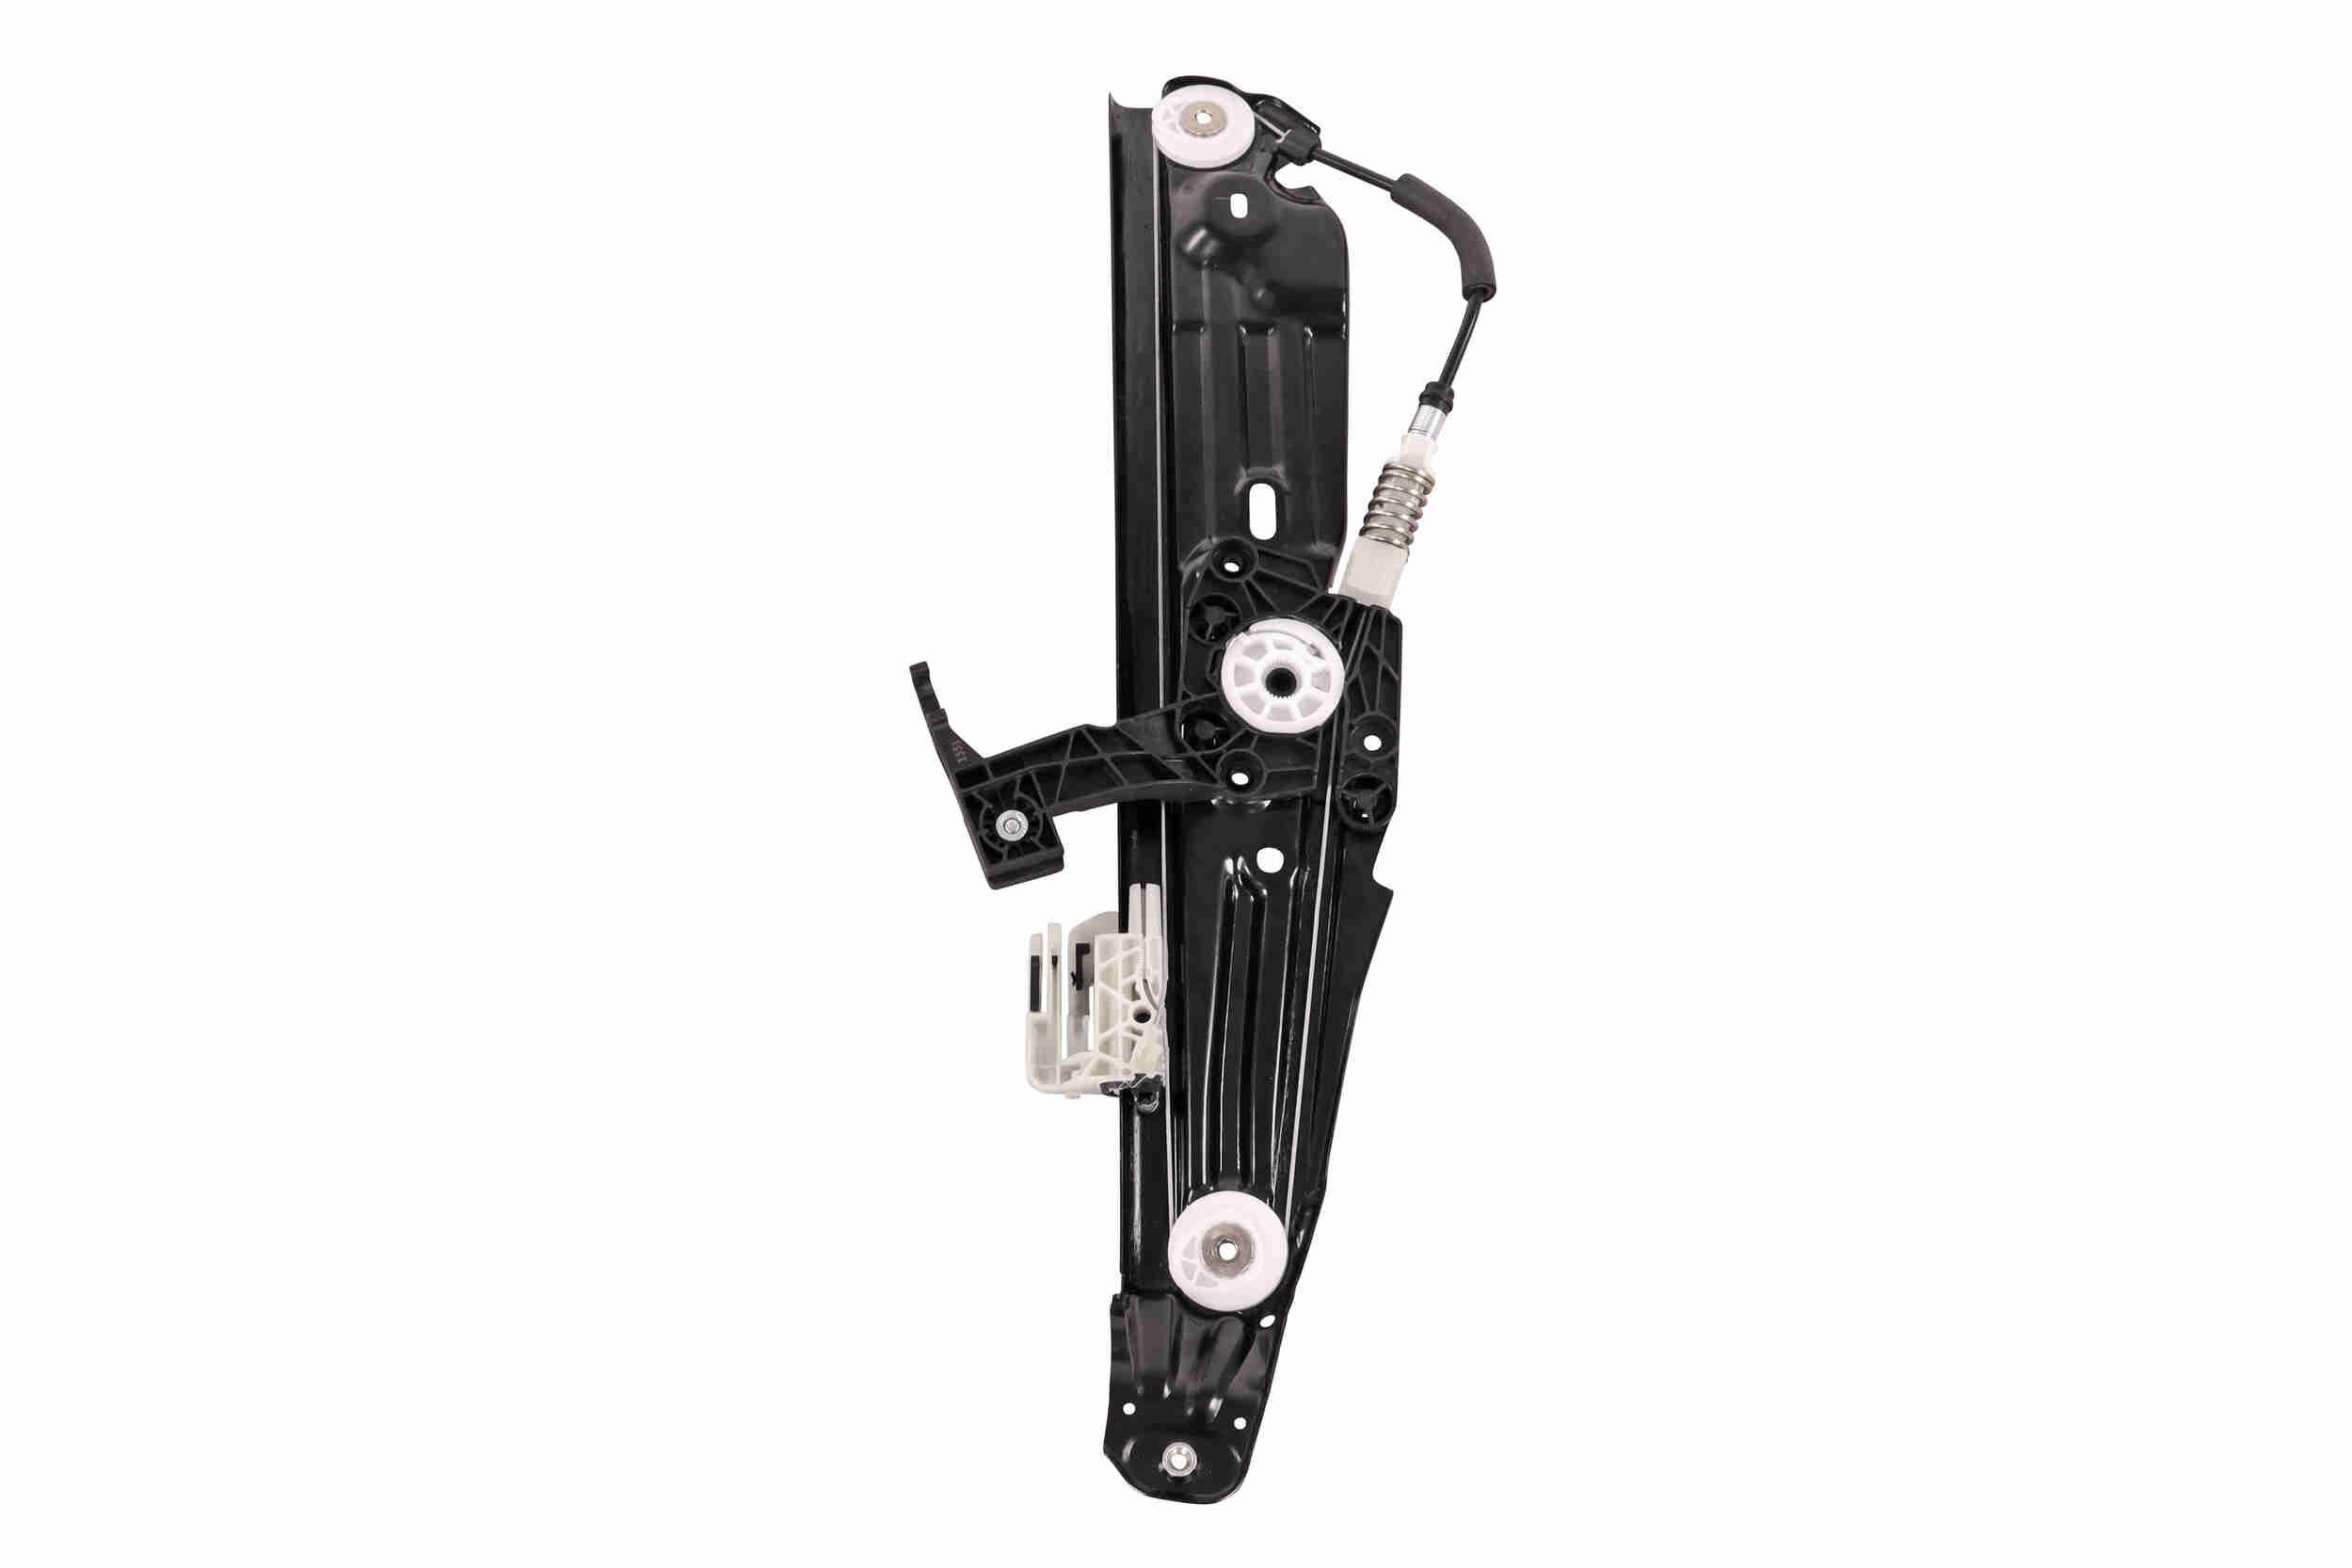 V37-0003 VAICO Anschraubfilter, mit einem Rücklaufsperrventil, Original VAICO Qualität Innendurchmesser 2: 59,7mm, Innendurchmesser 2: 71,2mm, Ø: 102mm, Höhe: 126,6mm Ölfilter V37-0003 günstig kaufen